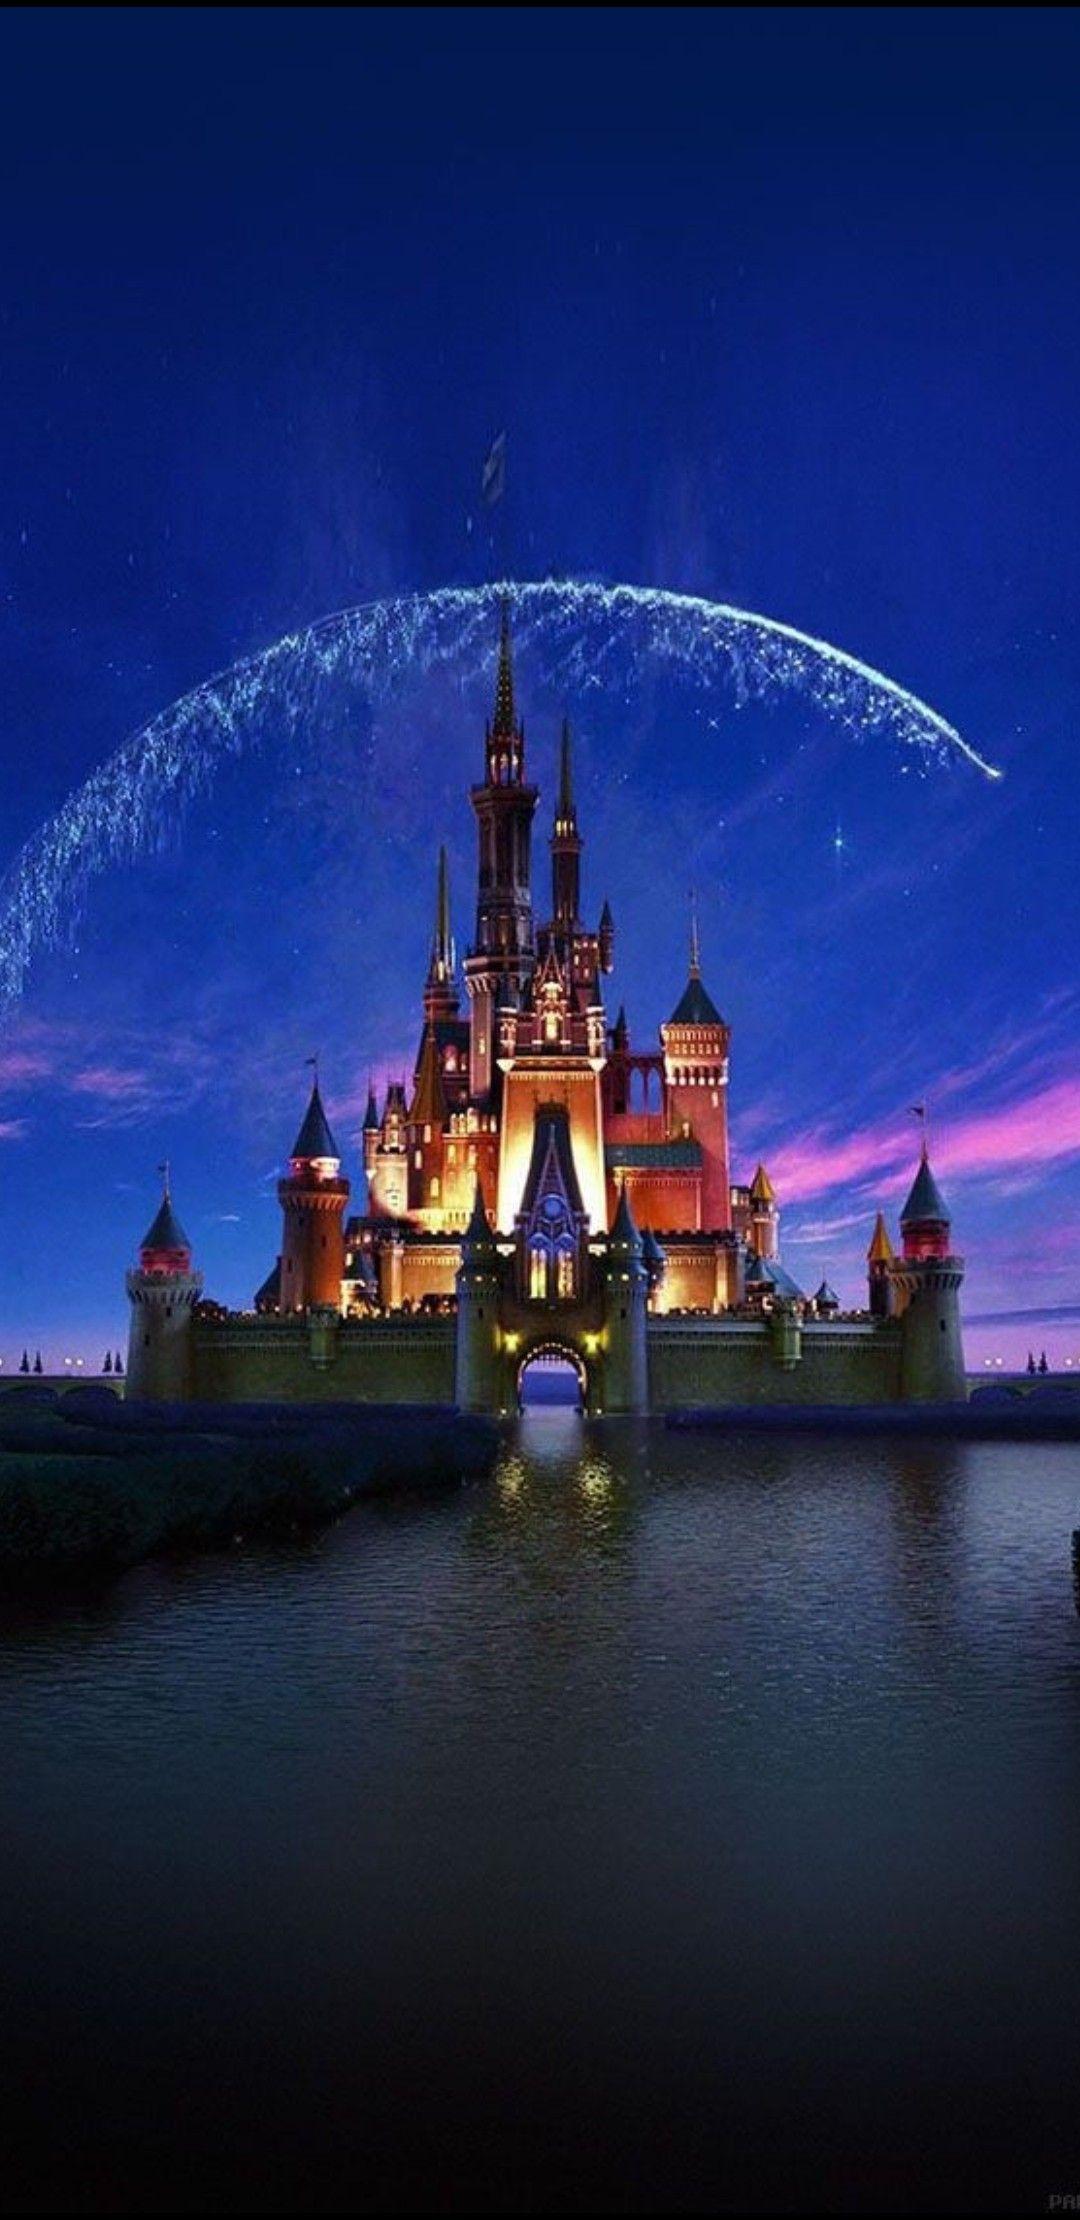 Epingle Par Alovera Sur Backup Backdrops Image Fond Ecran Fond Ecran Disney Fond D Ecran Iphone Disney